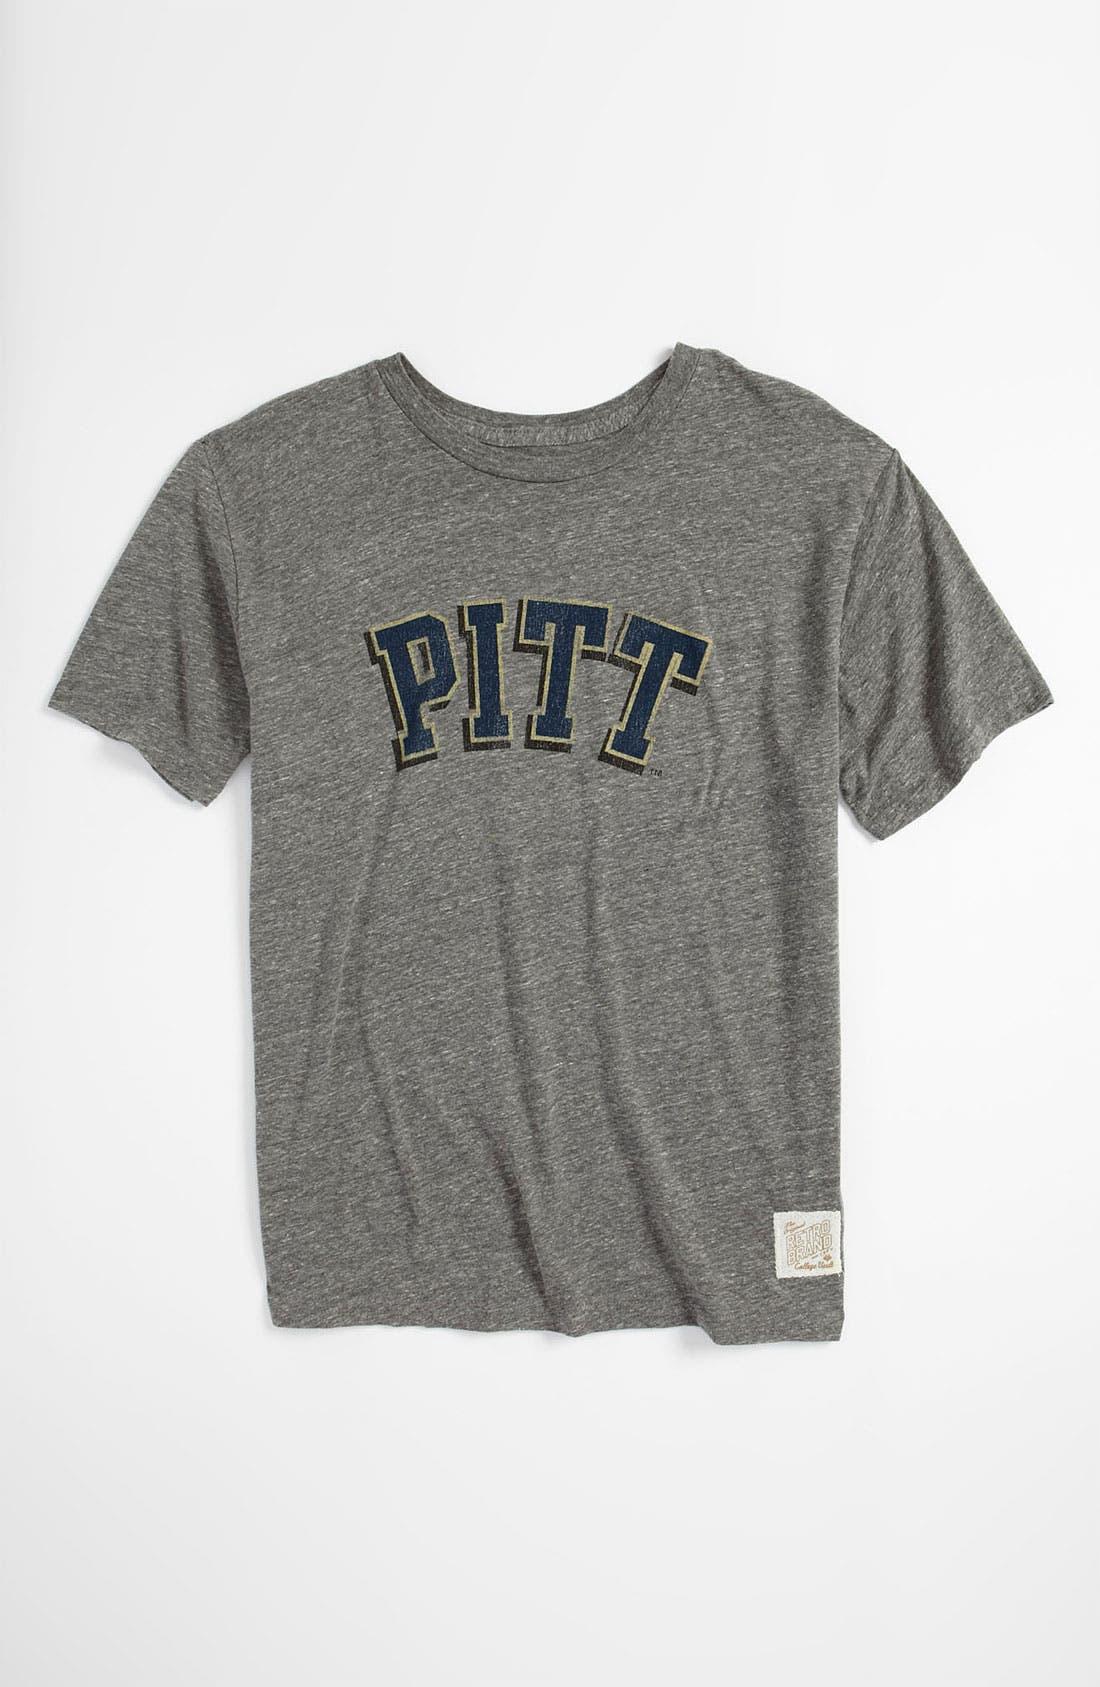 Main Image - Retro Brand 'Pittsburgh' T-Shirt (Big Boys)